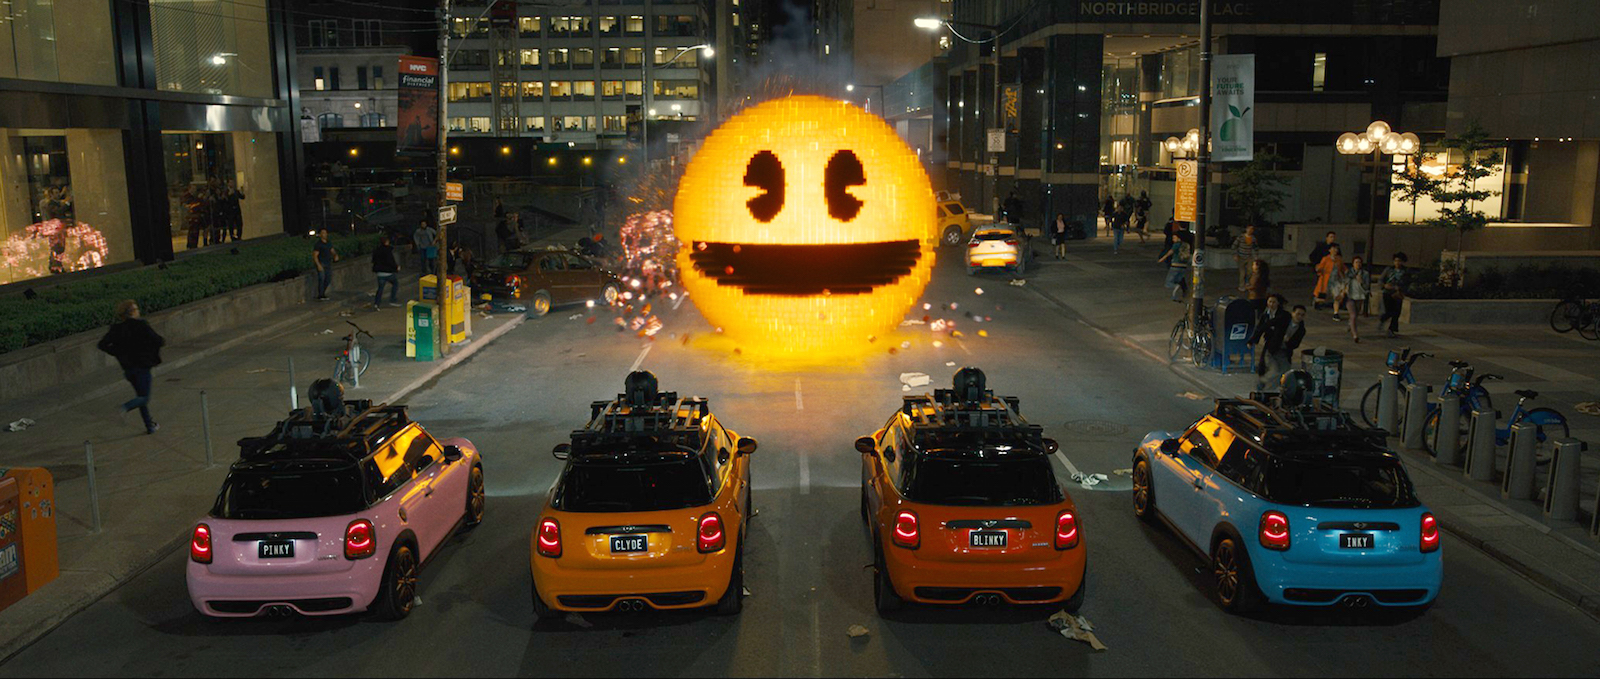 Pixels: faccia a faccia con Pac Man